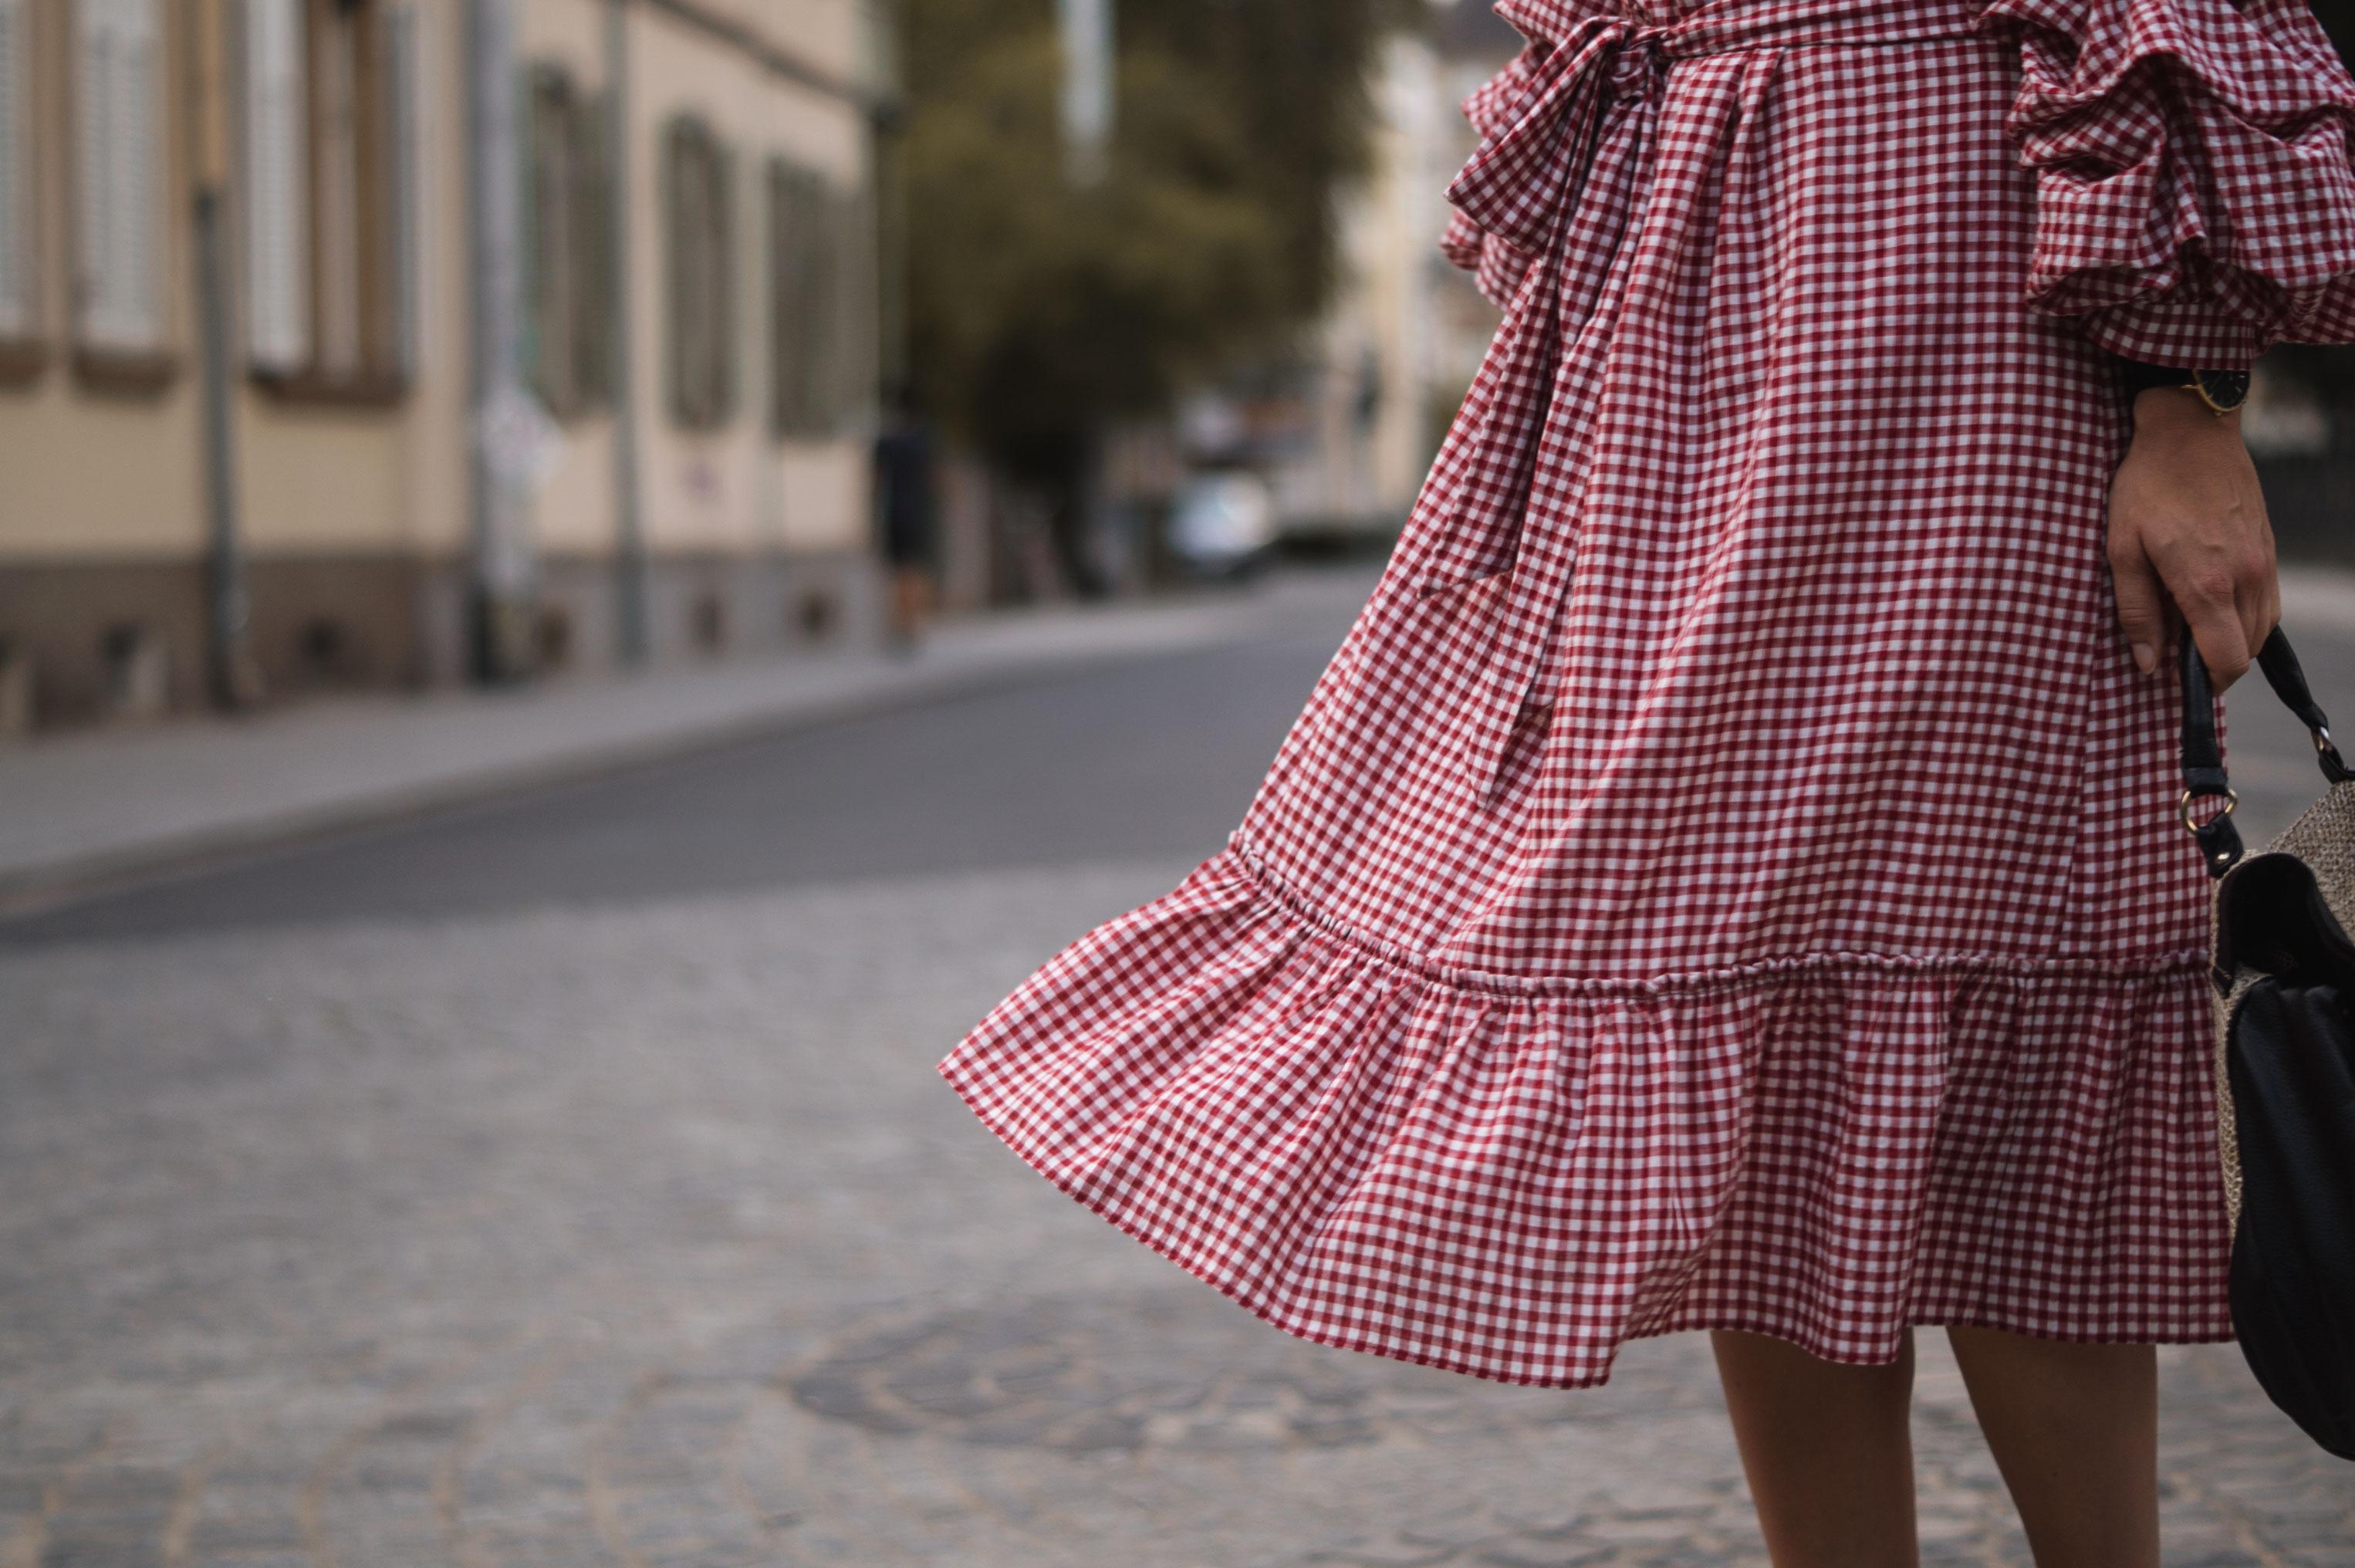 rotes Karokleid Zara off shoulder gingham Streetstyle Heidelberg Sariety Modeblog Fashionblogger-10